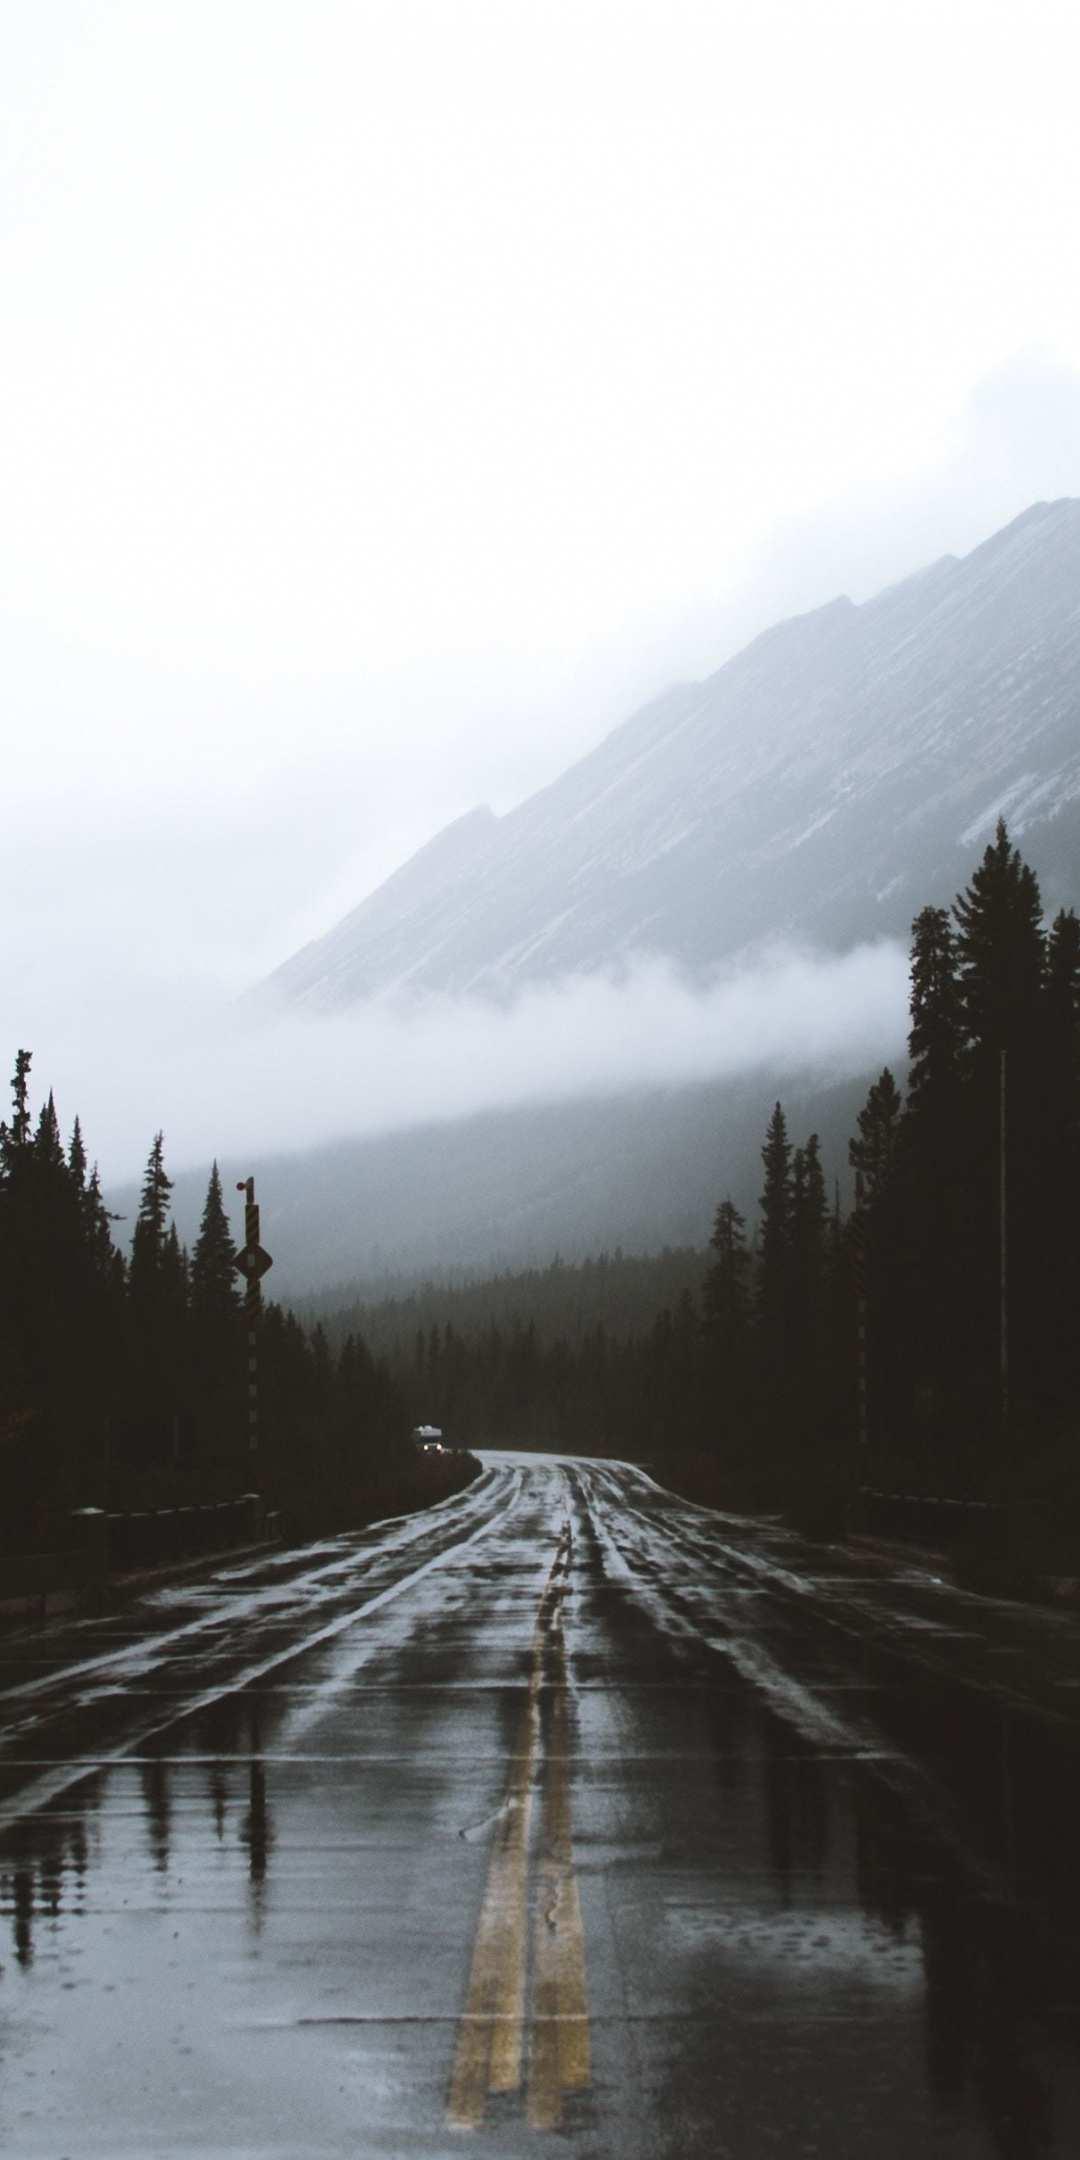 Alberta Canada road rainy day iPhone Wallpaper